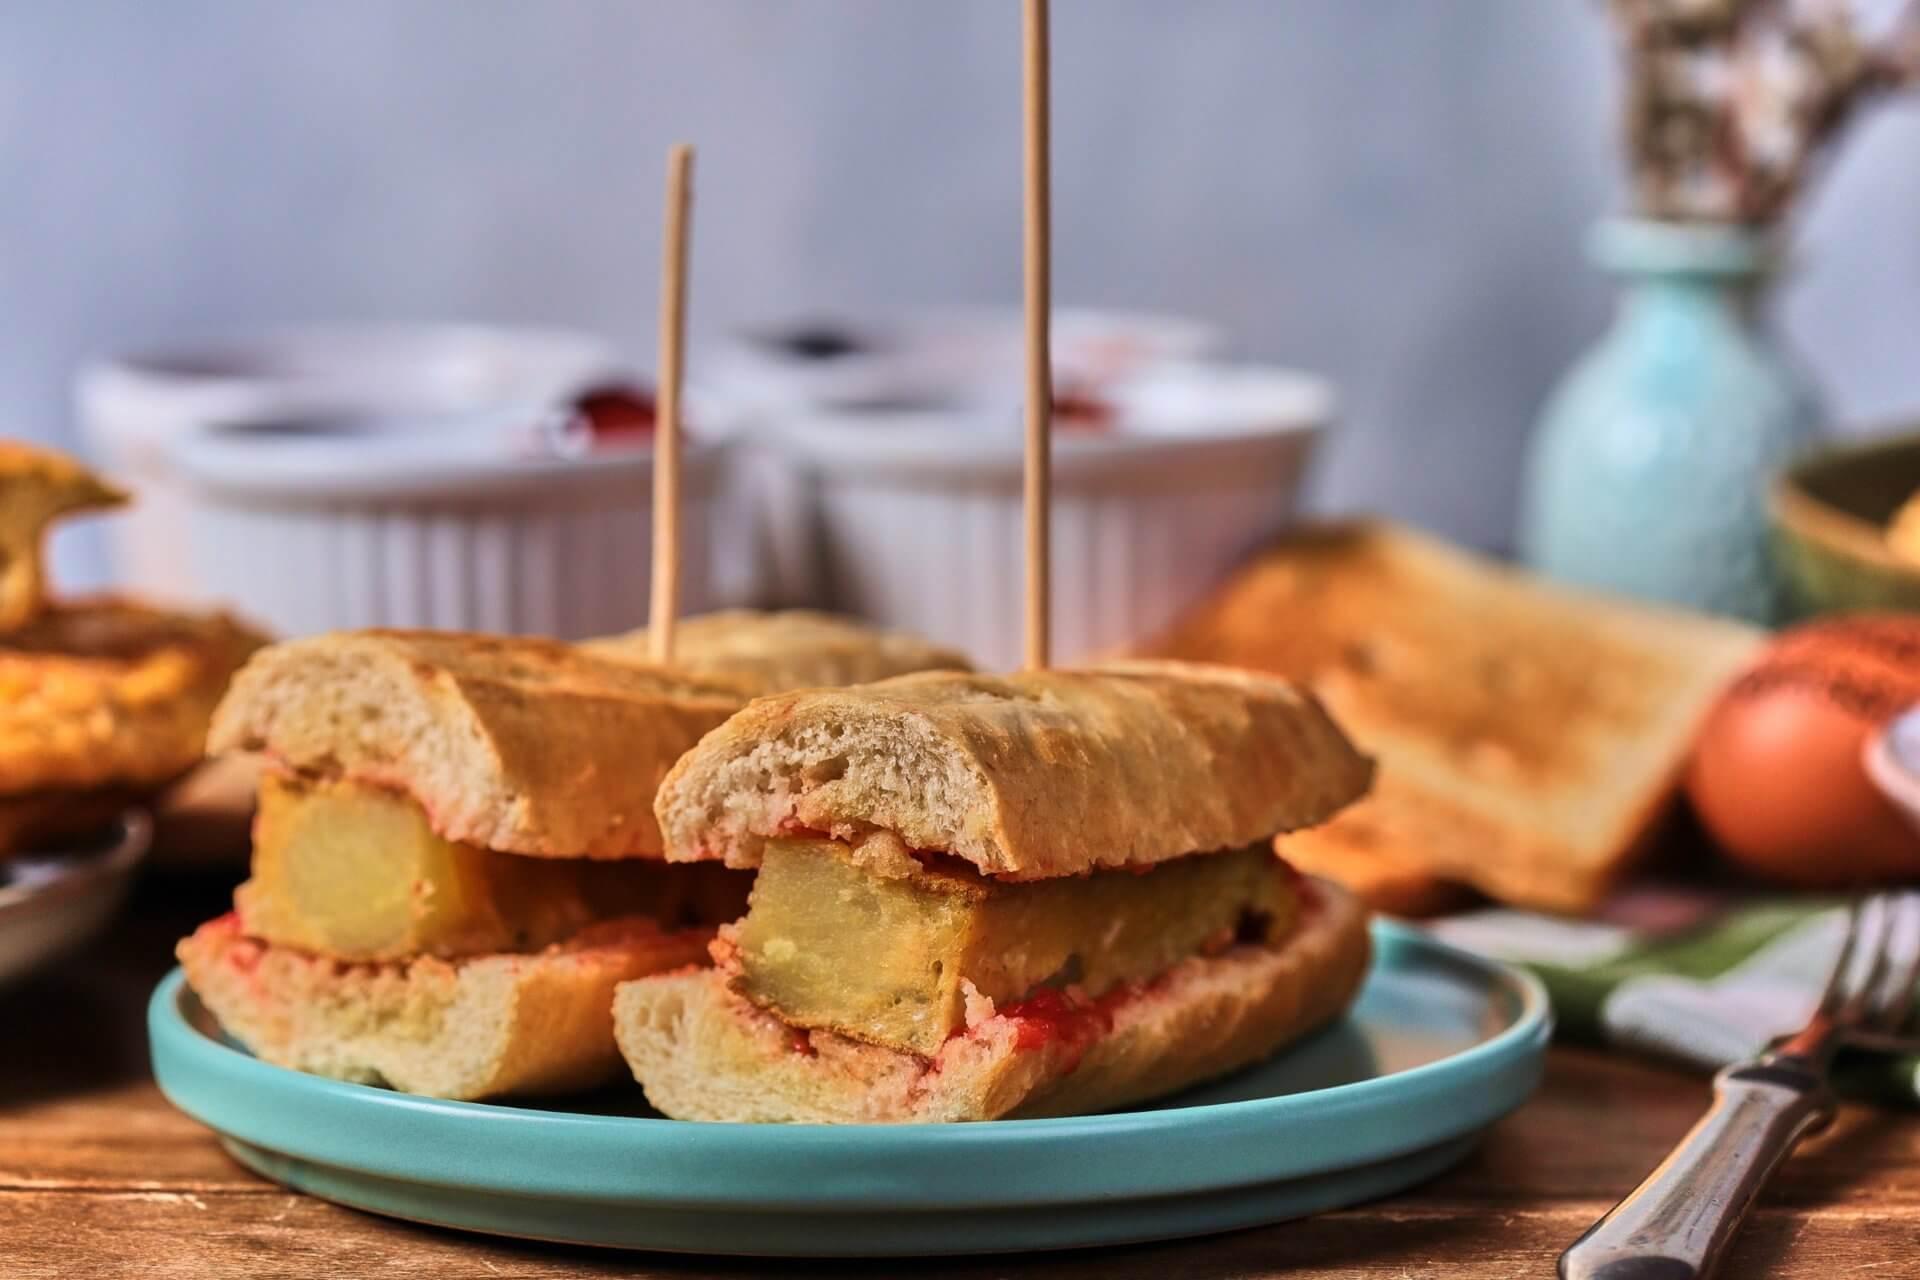 Spanyol tortilla tojásos reggelihez